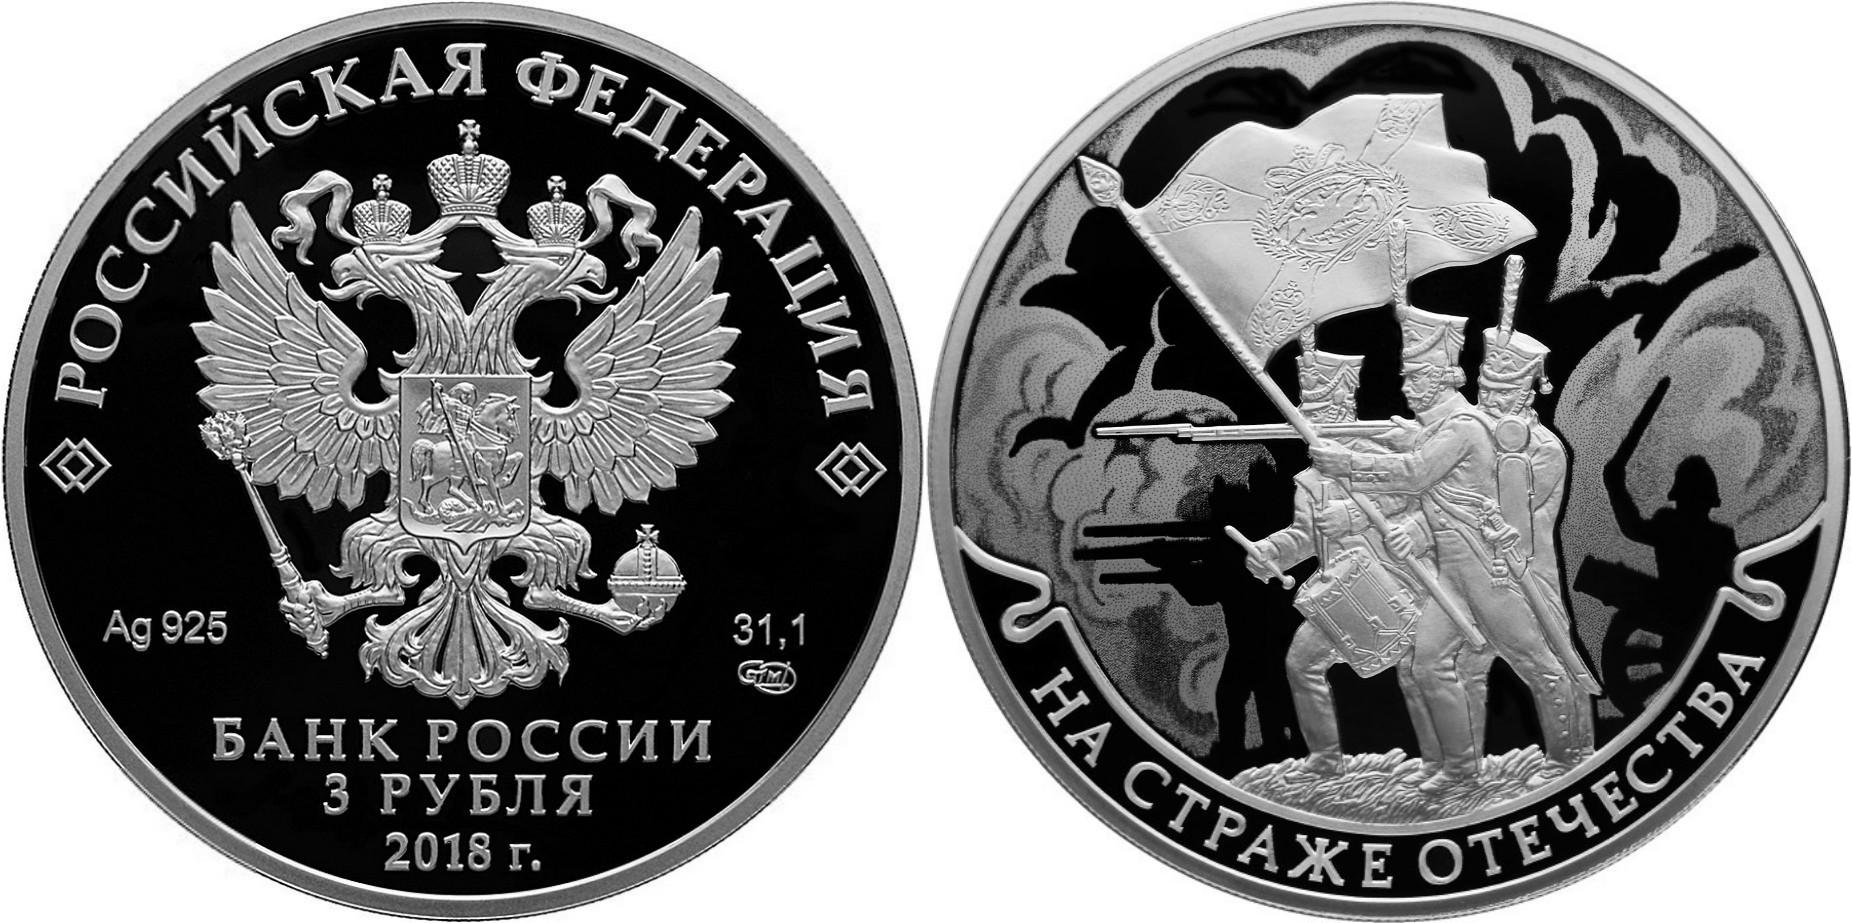 russie 2018 garder la patrie soldats 1812